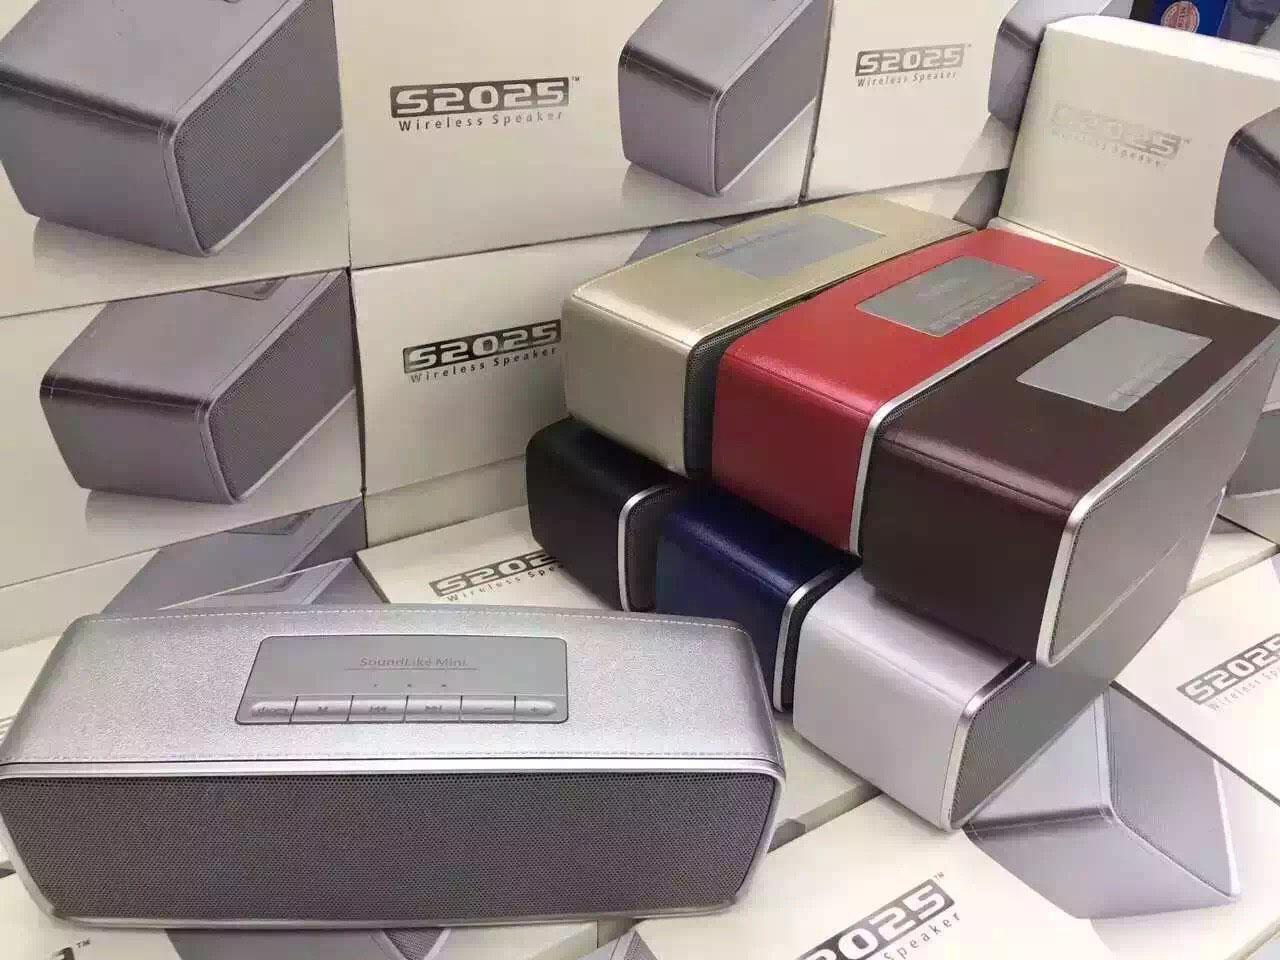 Bose Soundlink Mini - S2025 สินค้าไม่ใช่ของแท้ รูปที่ 2